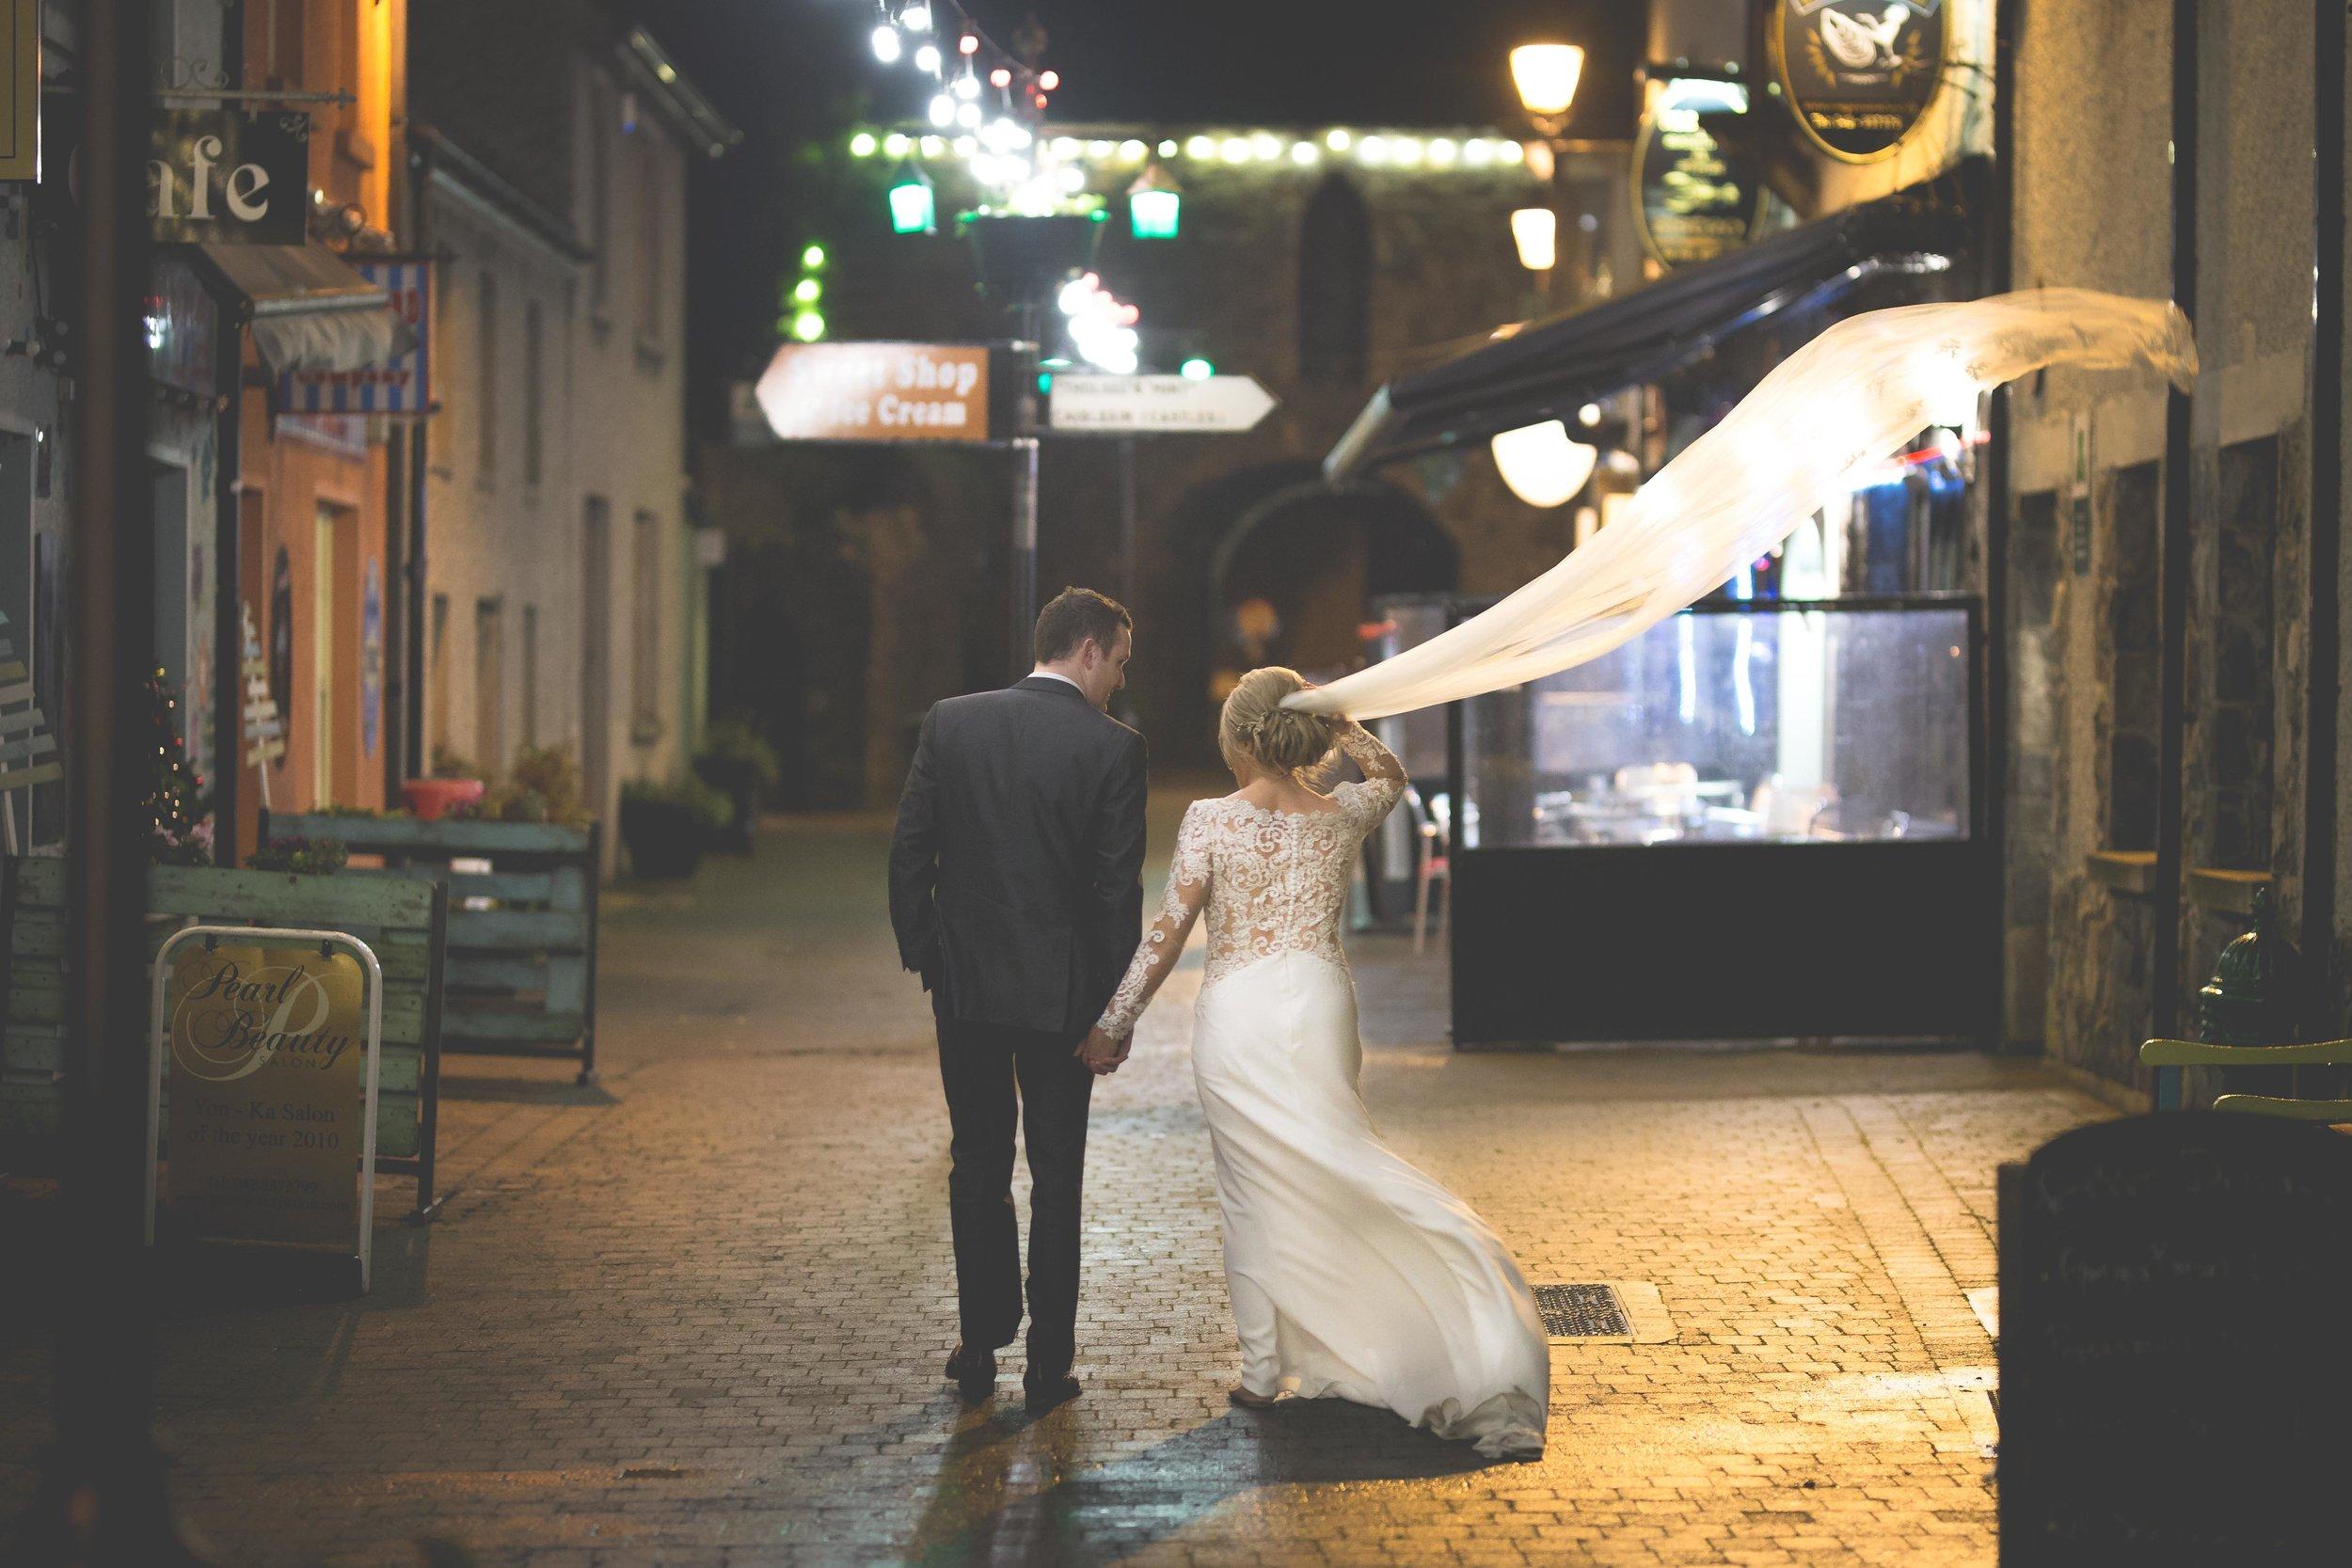 Northern Ireland Wedding Photographer   Brian McEwan Photography   Affordable Wedding Photography Throughout Antrim Down Armagh Tyrone Londonderry Derry Down Fermanagh -76.jpg